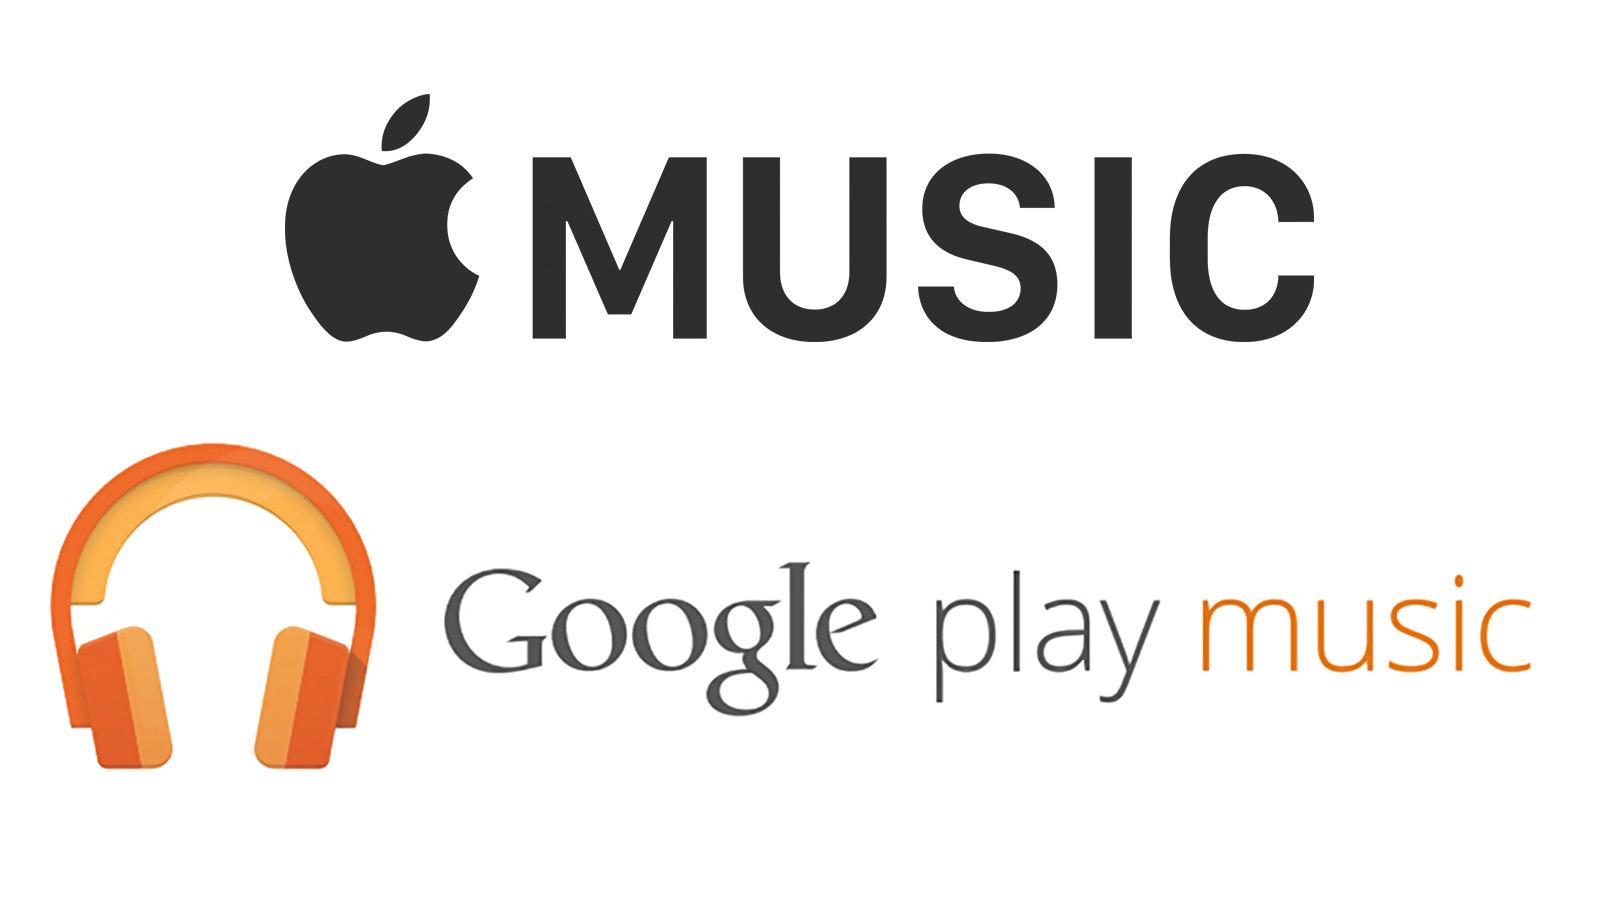 Apple Music Google Play Music 聴き放題